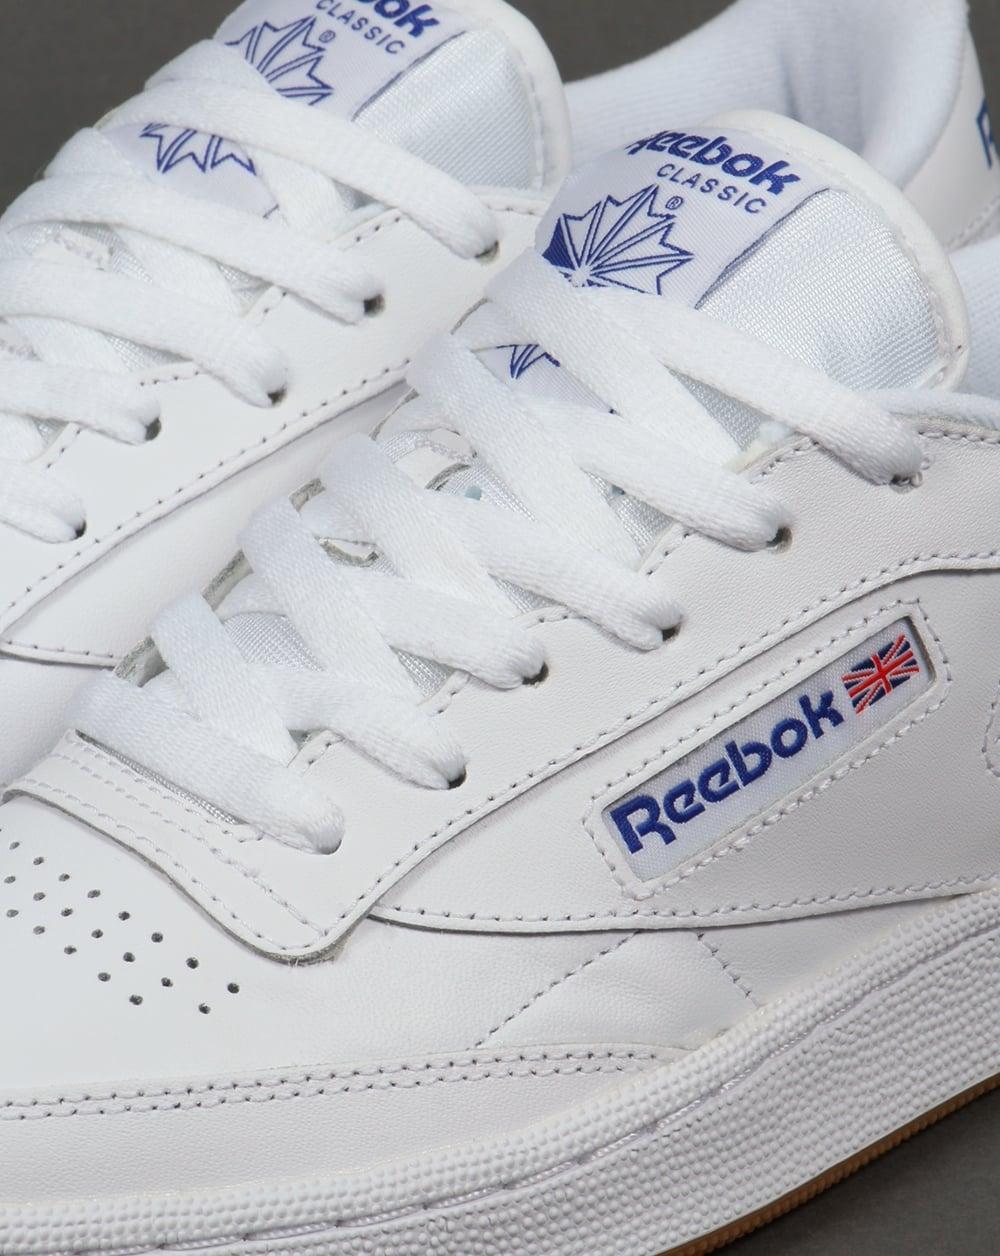 46e6320d095 Reebok Club C 85 Trainers in White Royal Gum